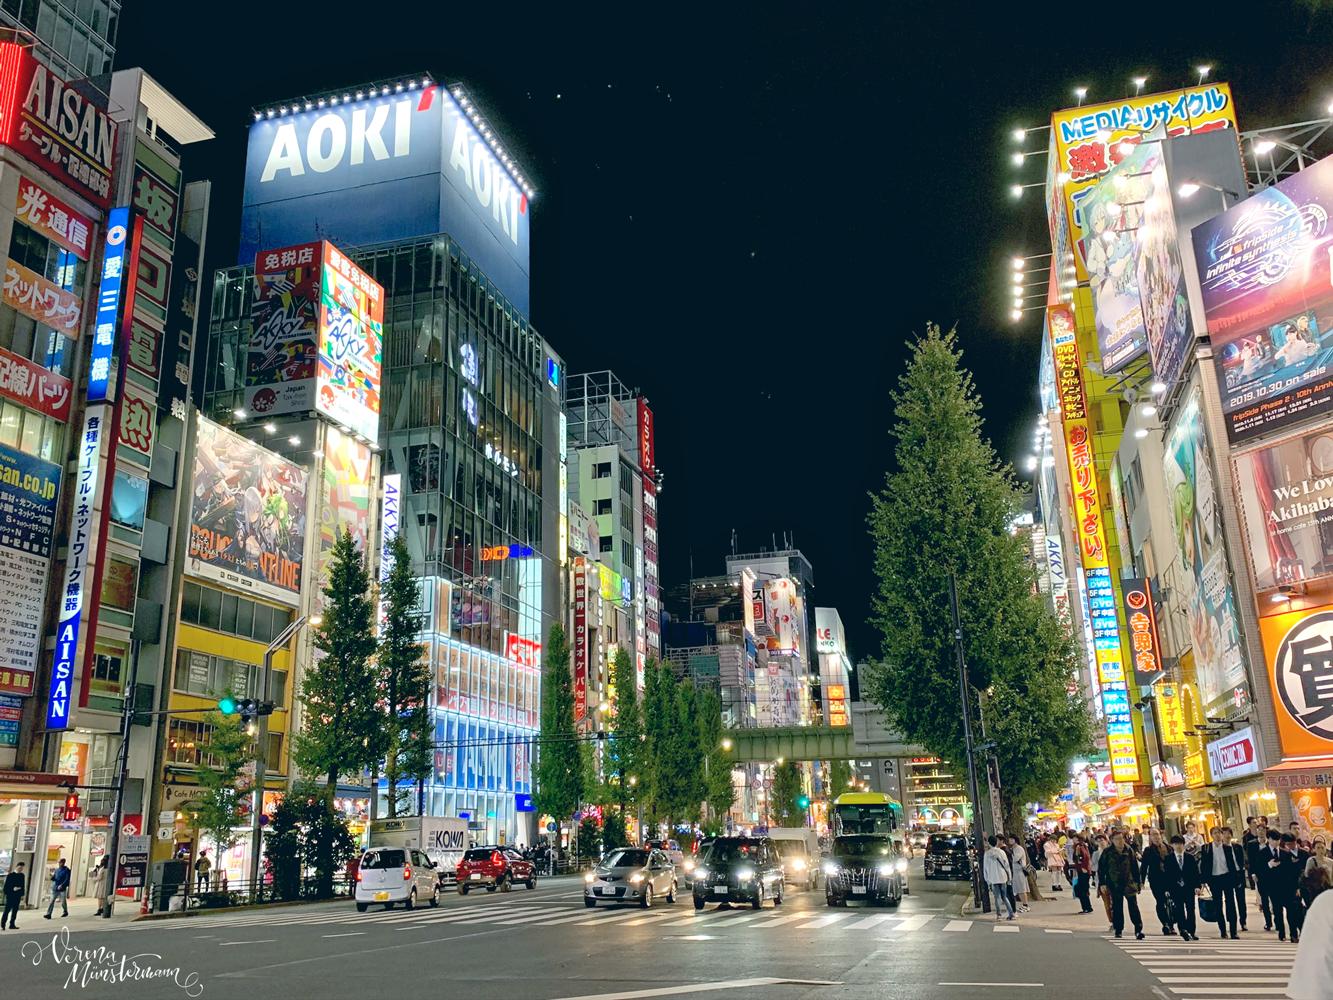 tokio - nach-Japan-reisen - akihabara - moreconfetti